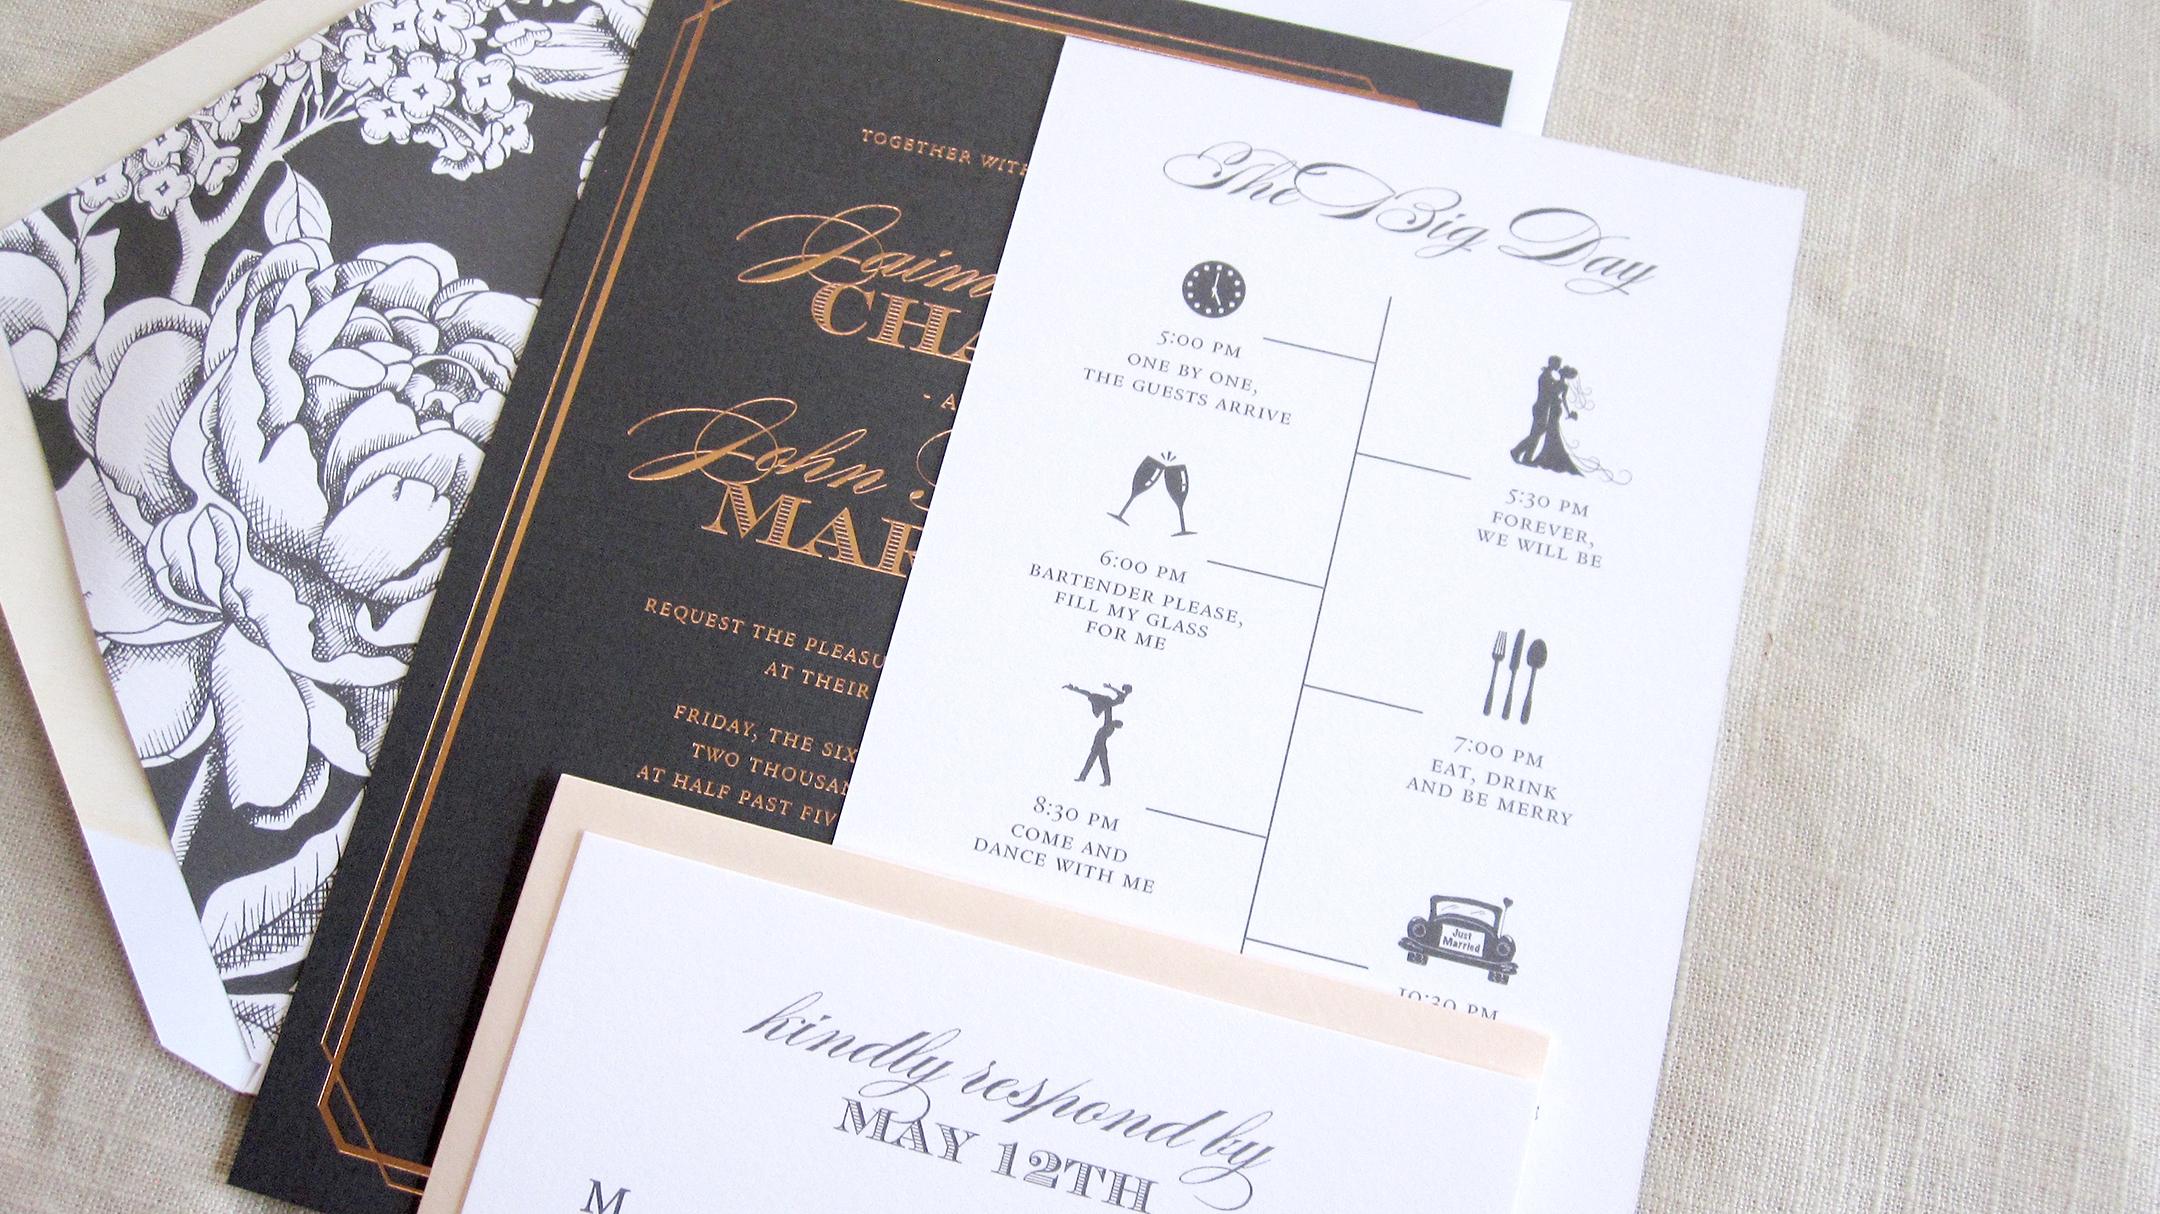 Baltimore_wedding_invitations_floral.jpg